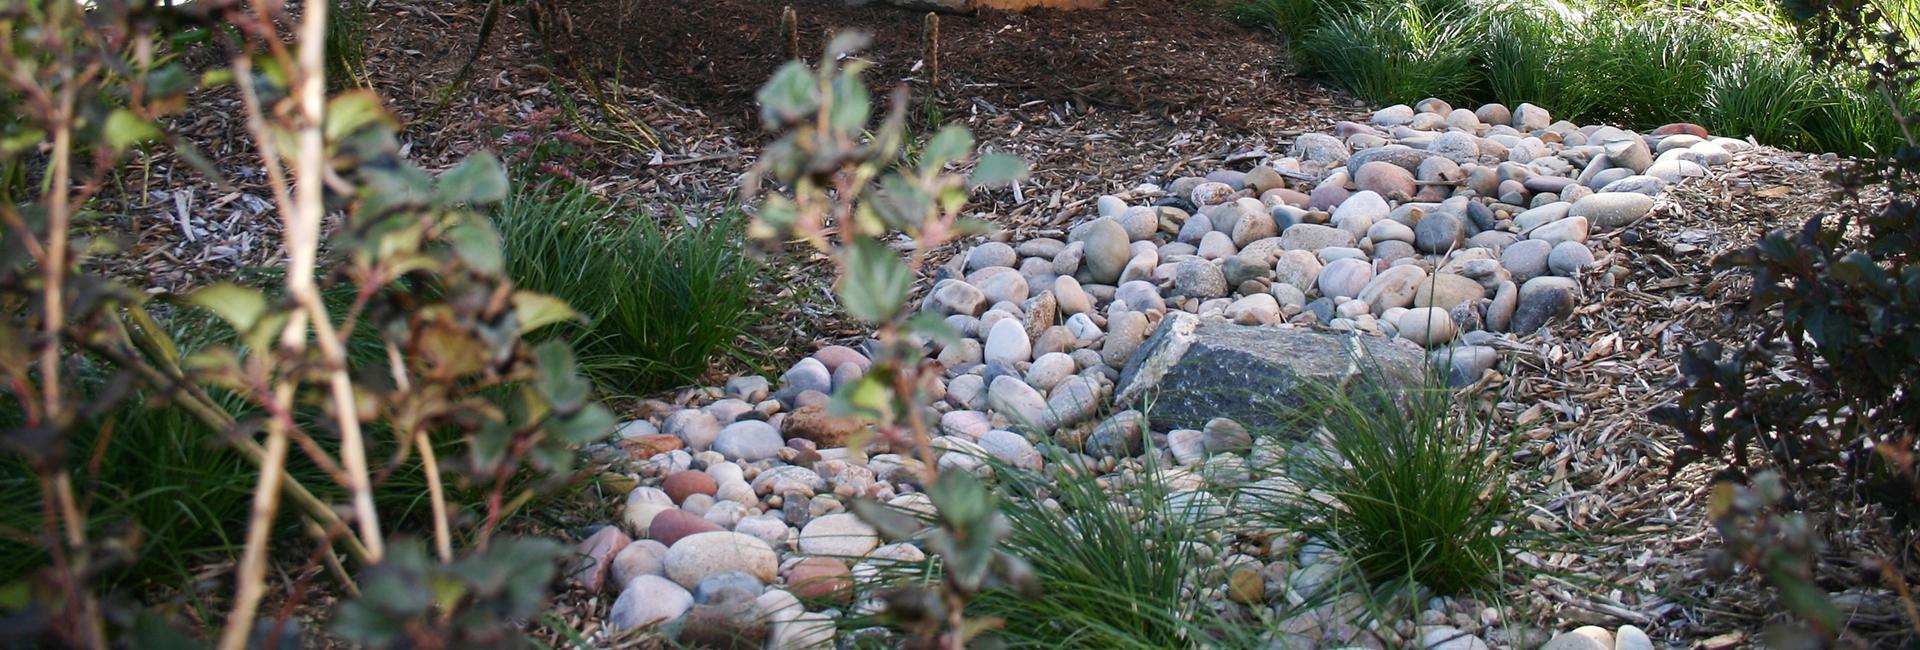 Students to Reveal Rain Garden Designs News University